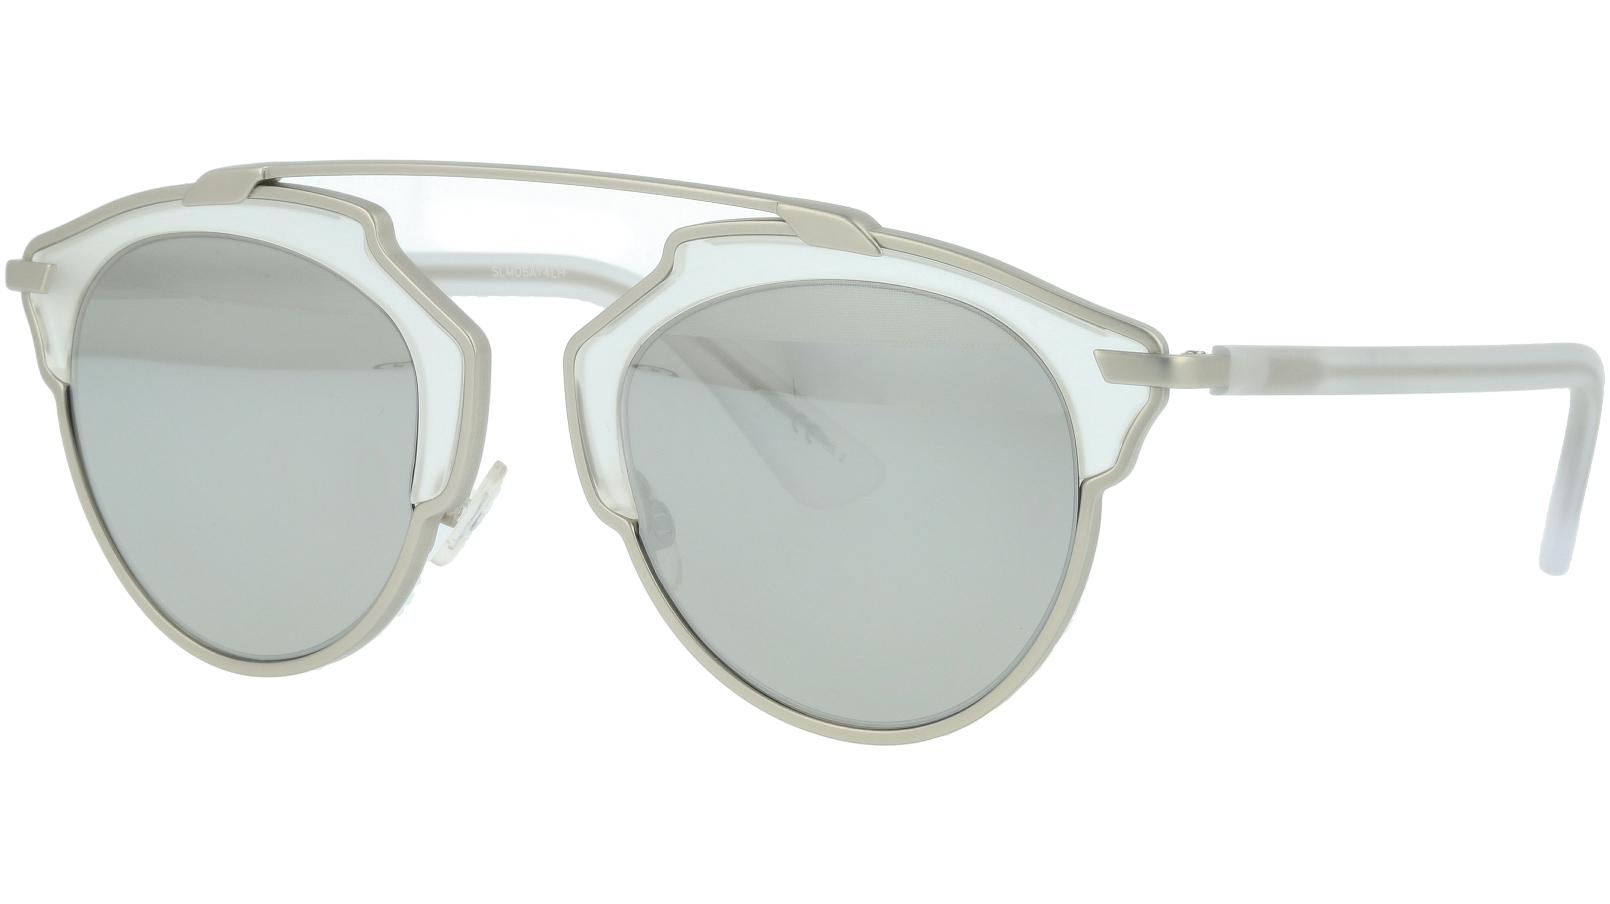 DIOR DIORSOREAL A00MD 48 PALLD Sunglasses